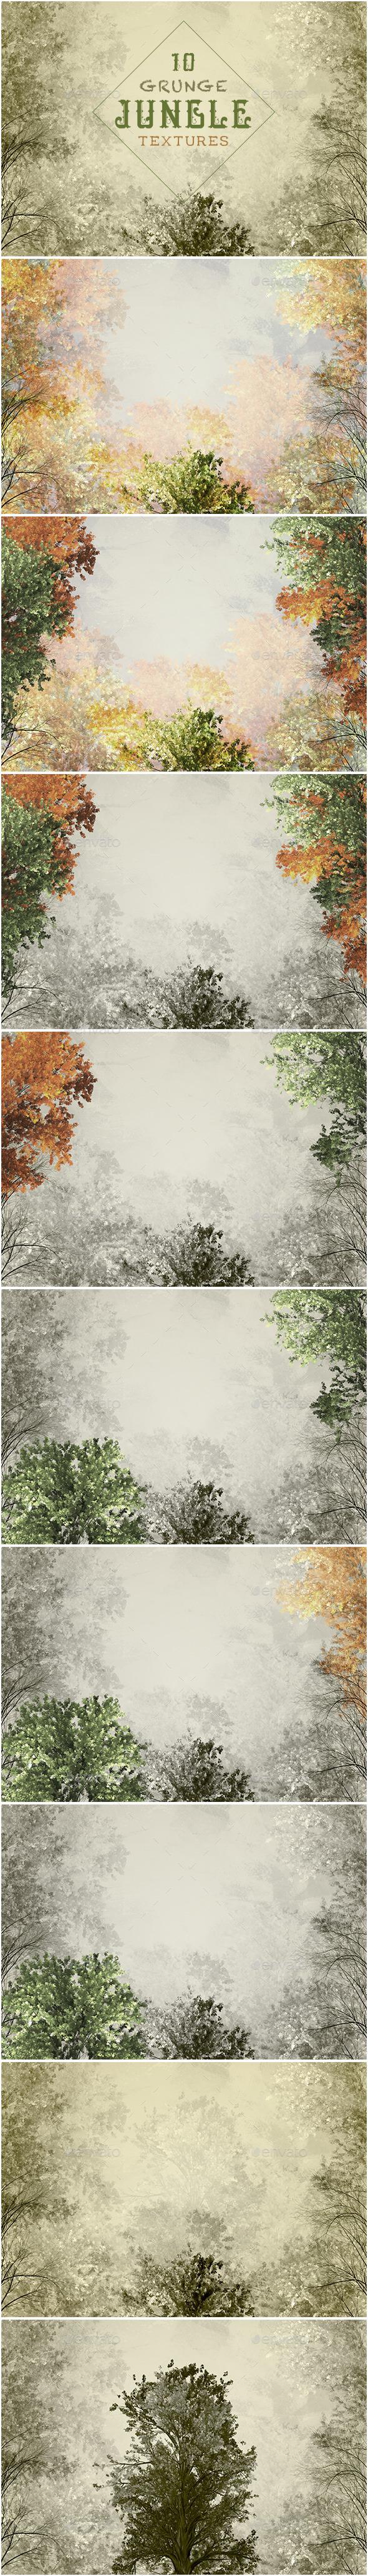 Grunge Jungle Textures - Industrial / Grunge Textures